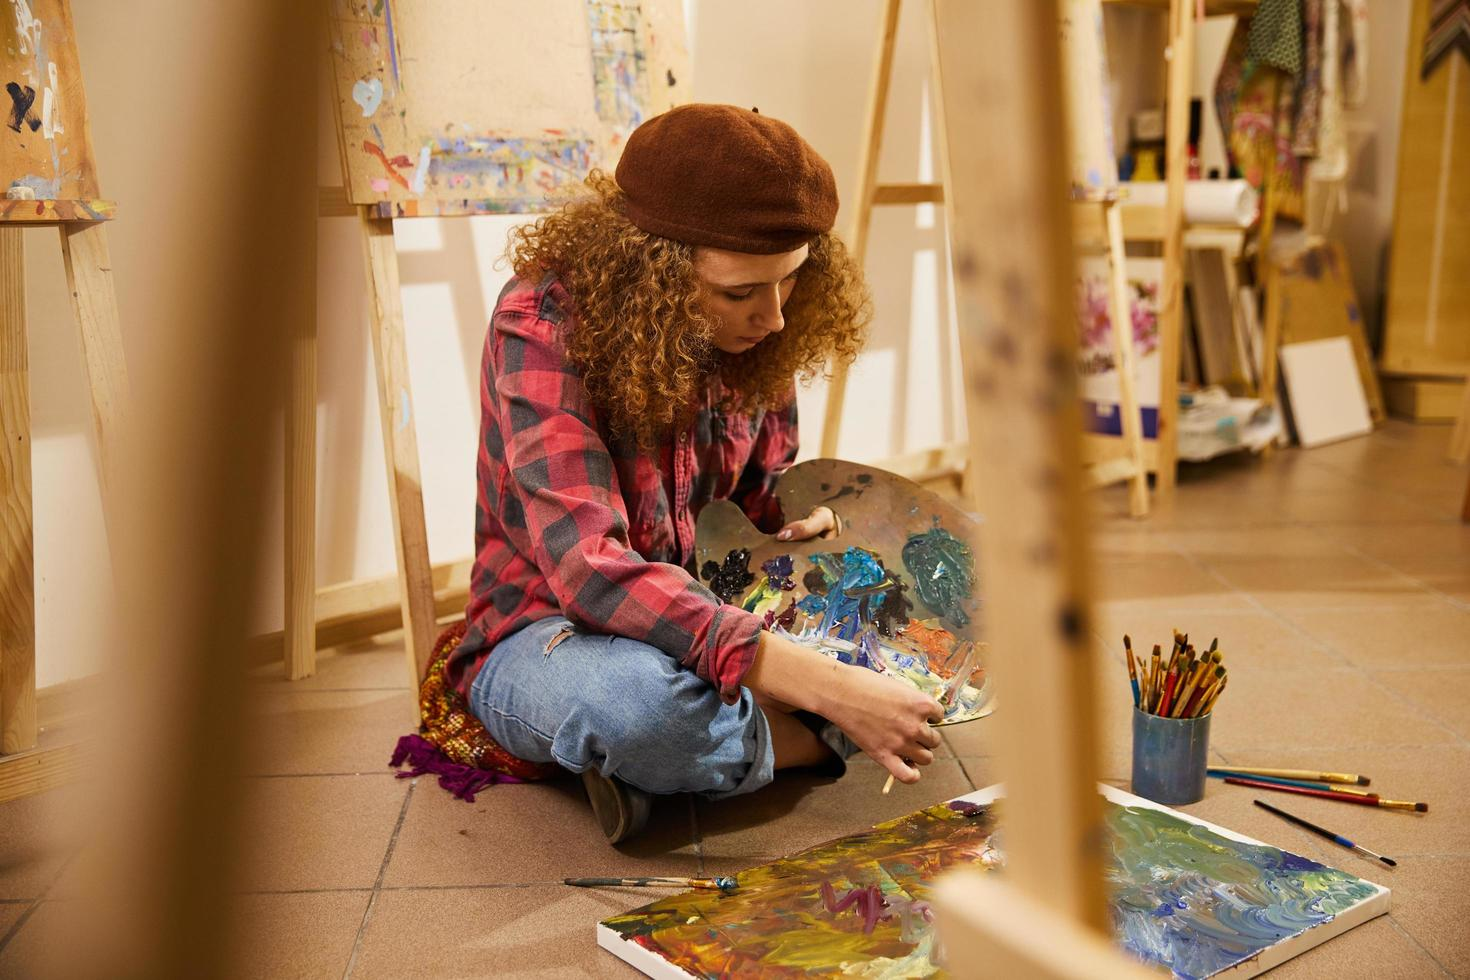 artiste peignant une toile photo